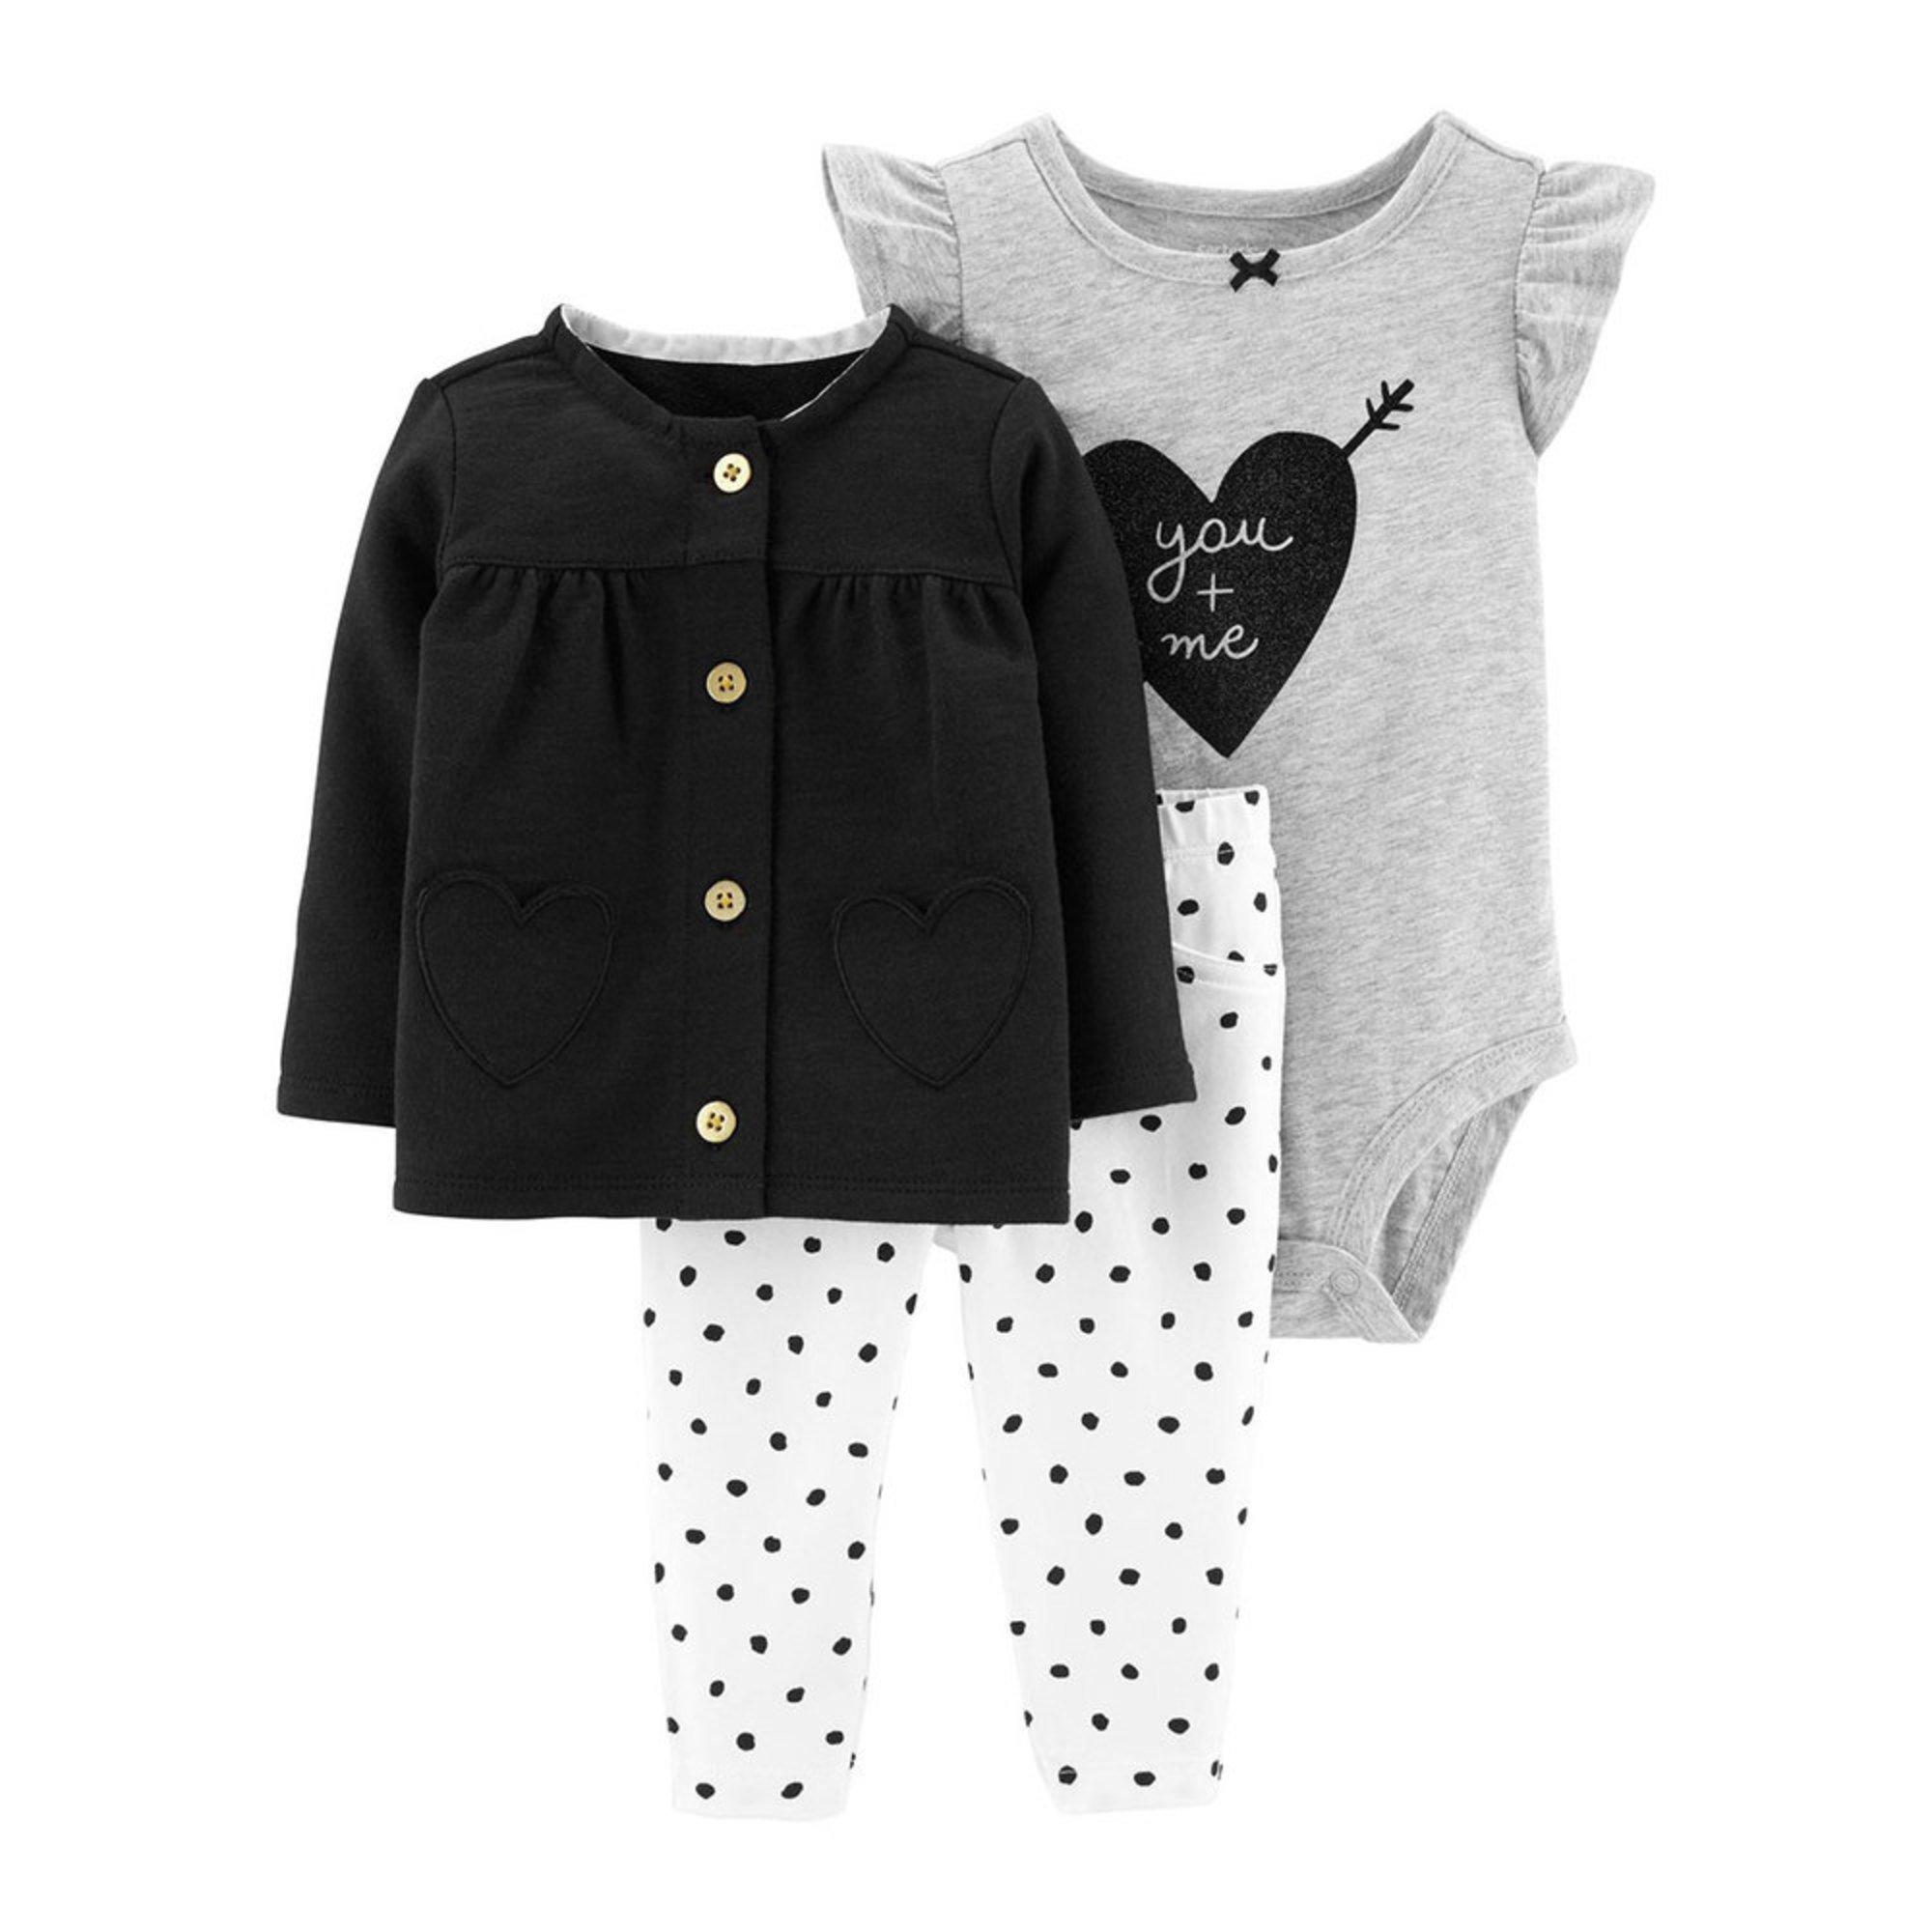 8d61cdad7 Carter's Baby Girls' 3-piece Heart Cardigan Set | Baby Girls' Sets ...